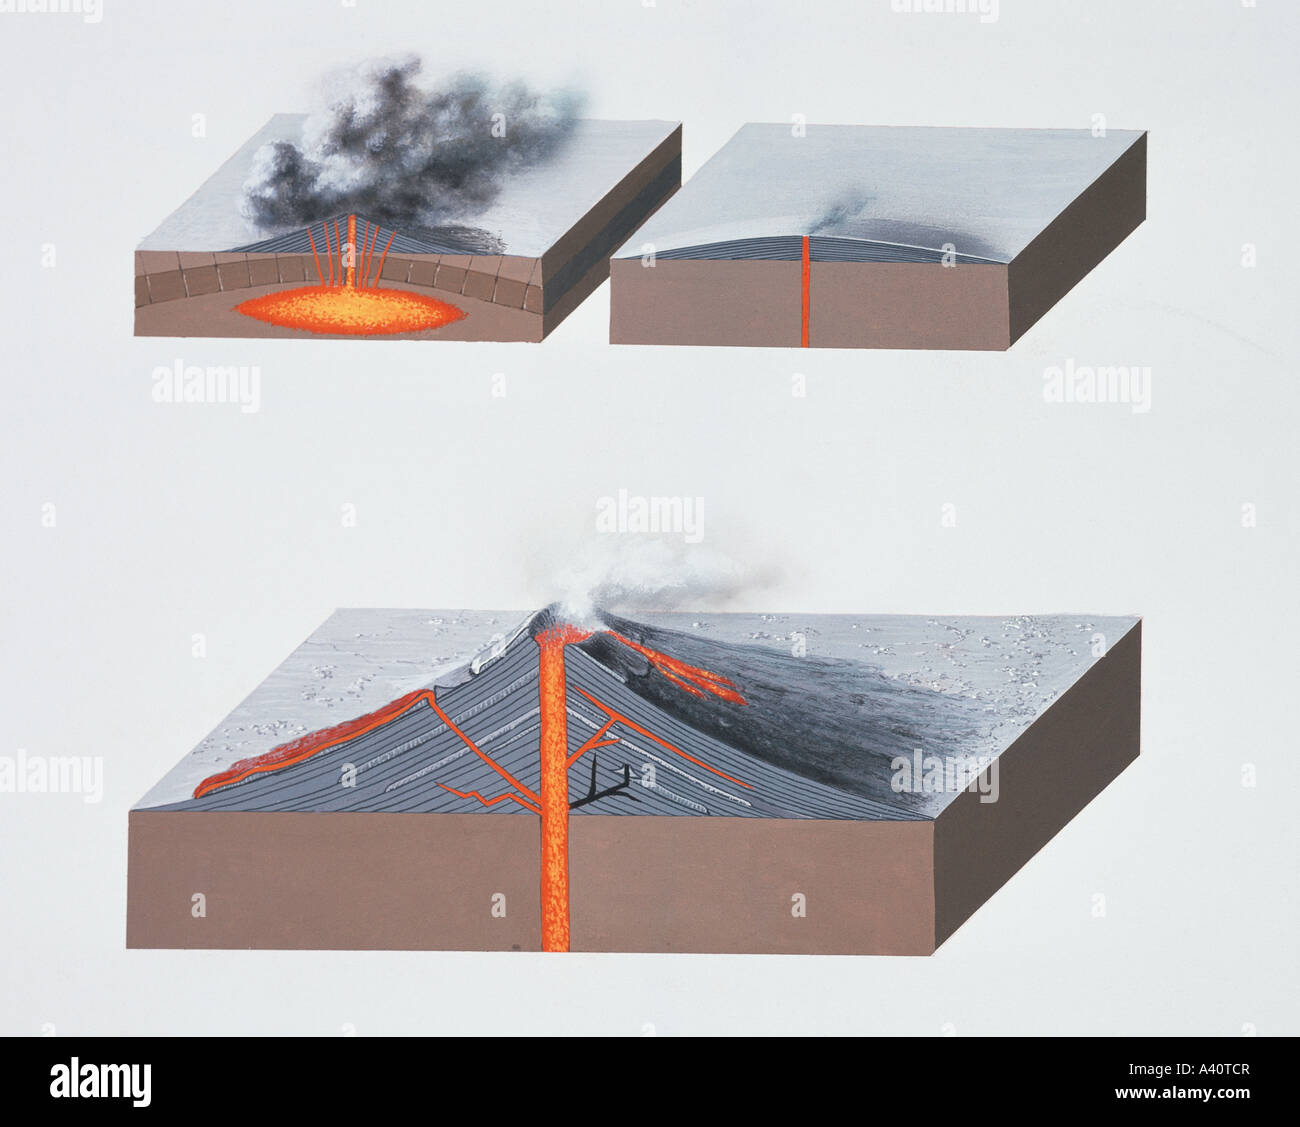 Volcano Diagram Stock Photos Images Alamy Volcanoes Types Image